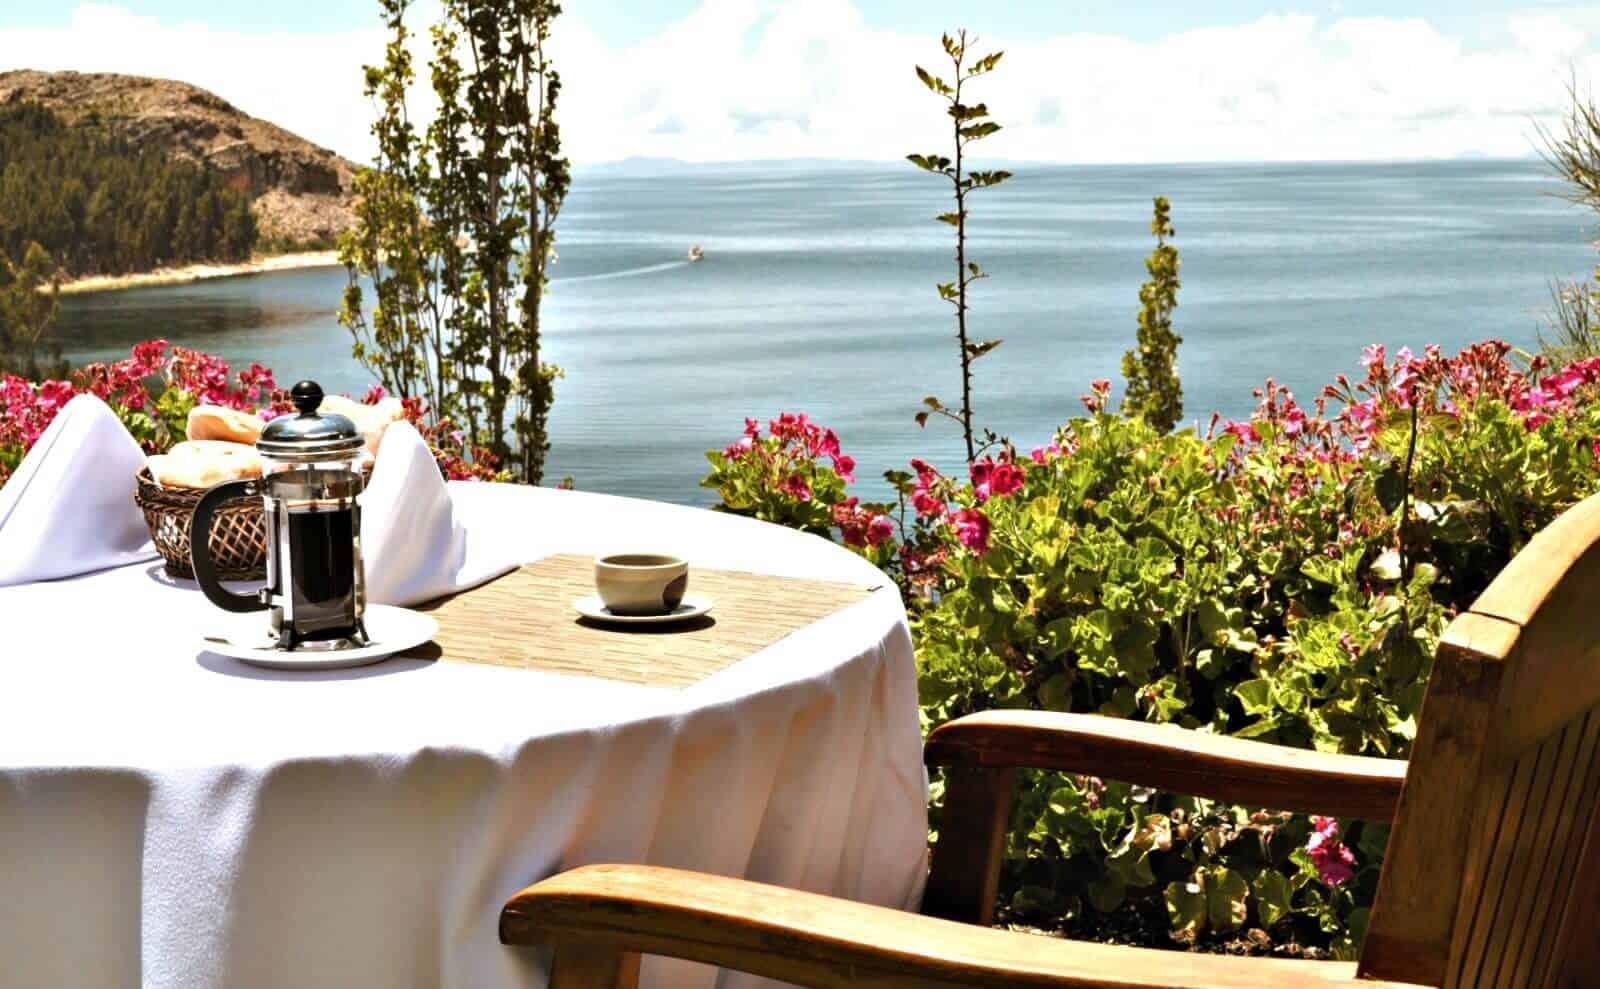 isla-suasi-hotel-essen-blick-see